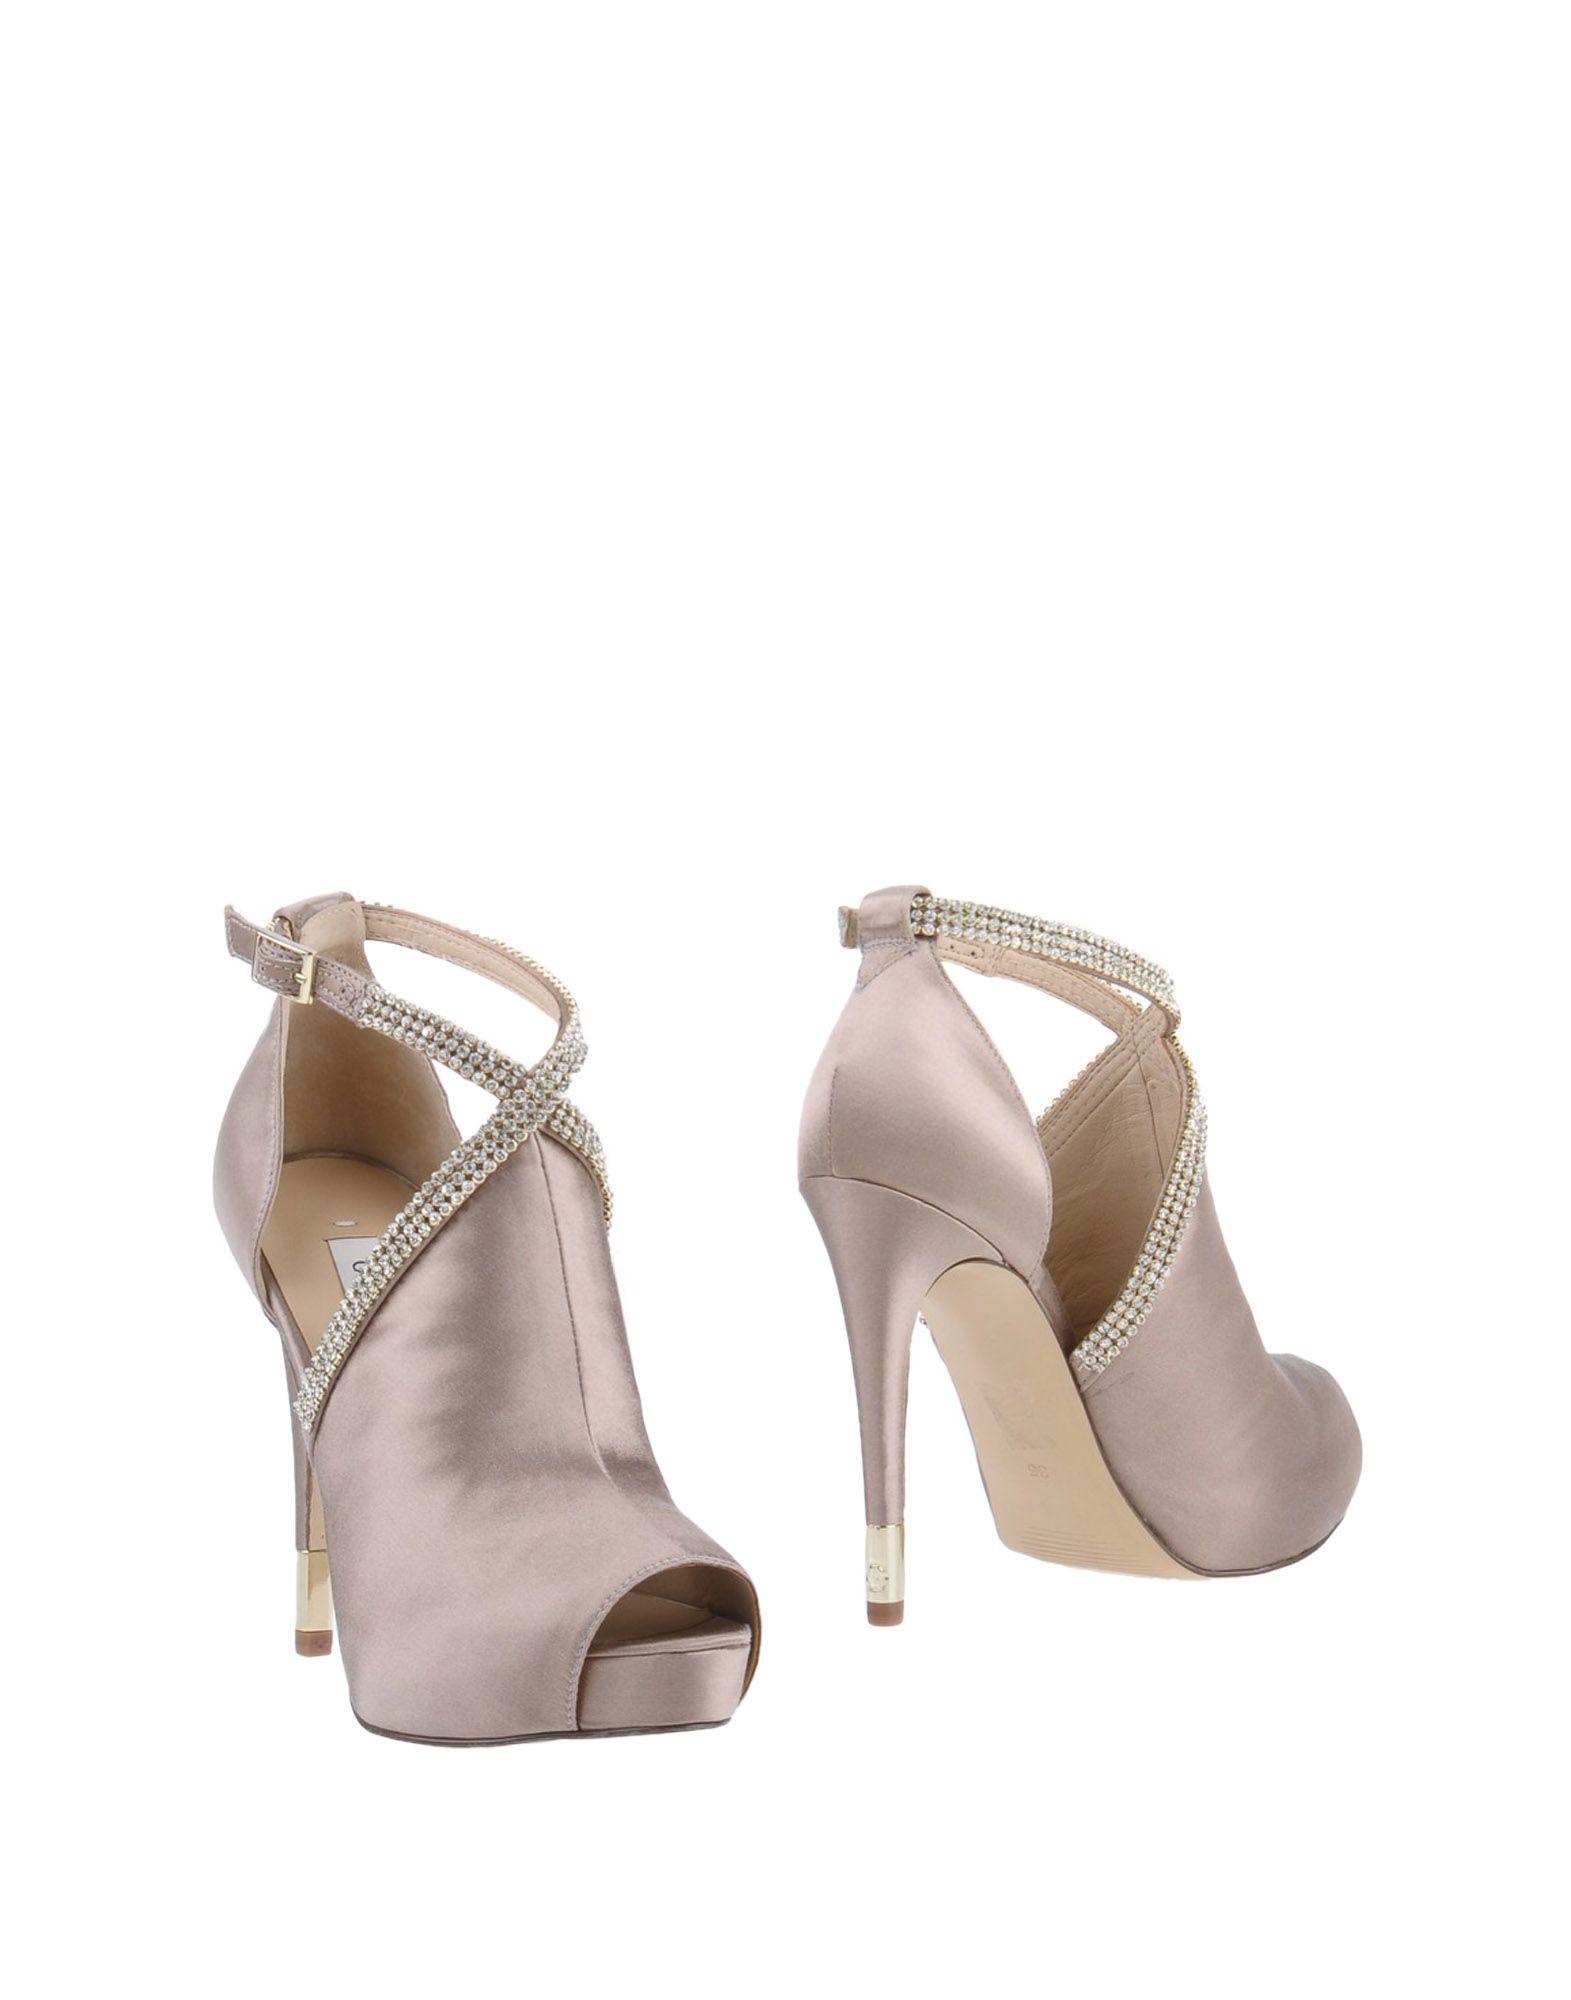 Guess Stiefelette Damen  11326086LX Gute Qualität beliebte Schuhe